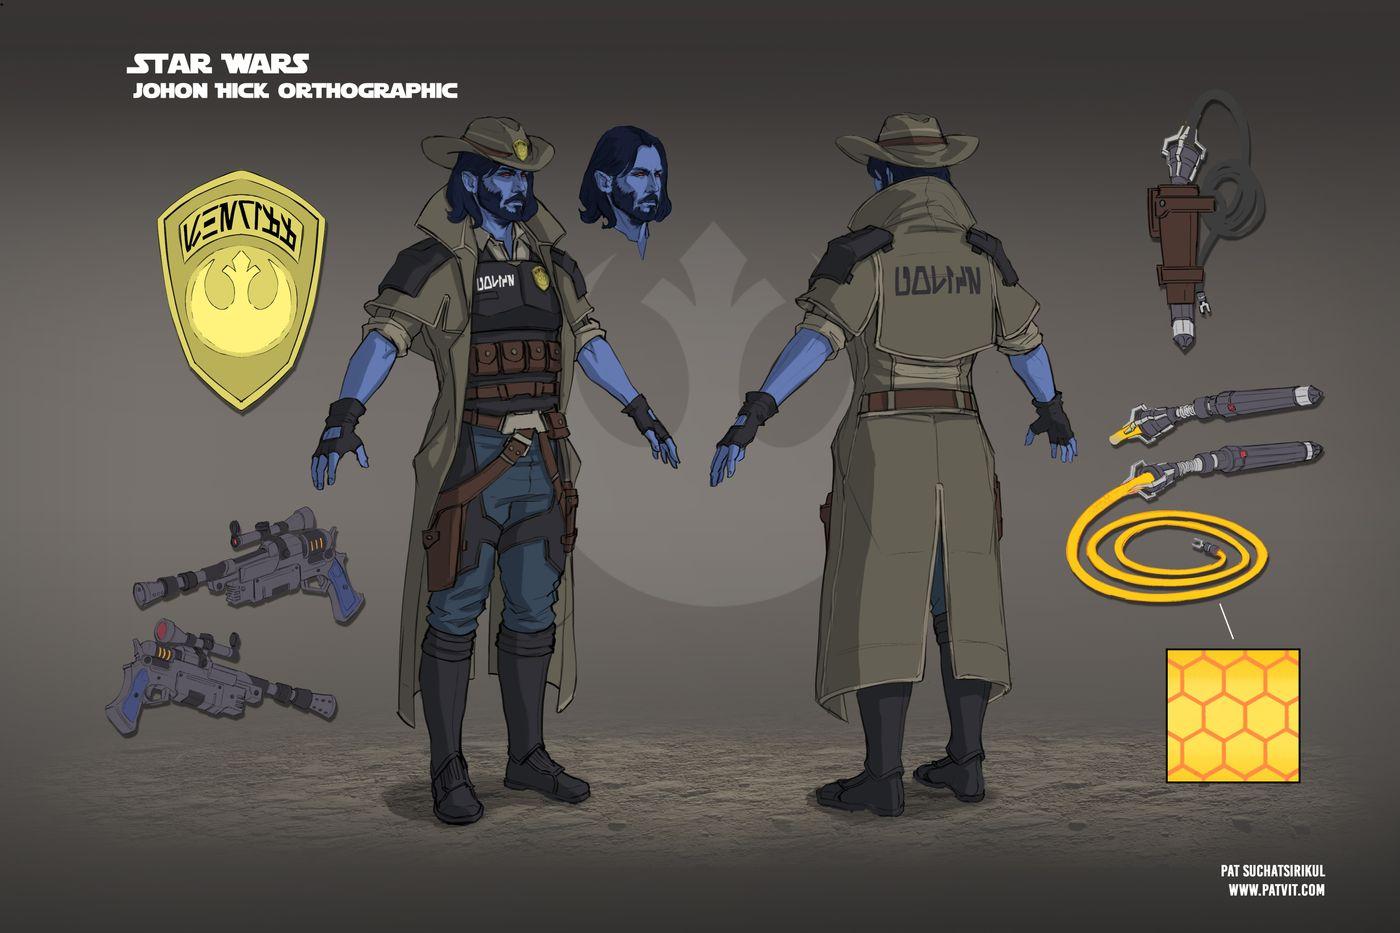 Suchatsirikul Pat Final Page16 Star Wars Johon Hick Chiss Sheriff Orthographic Patvit